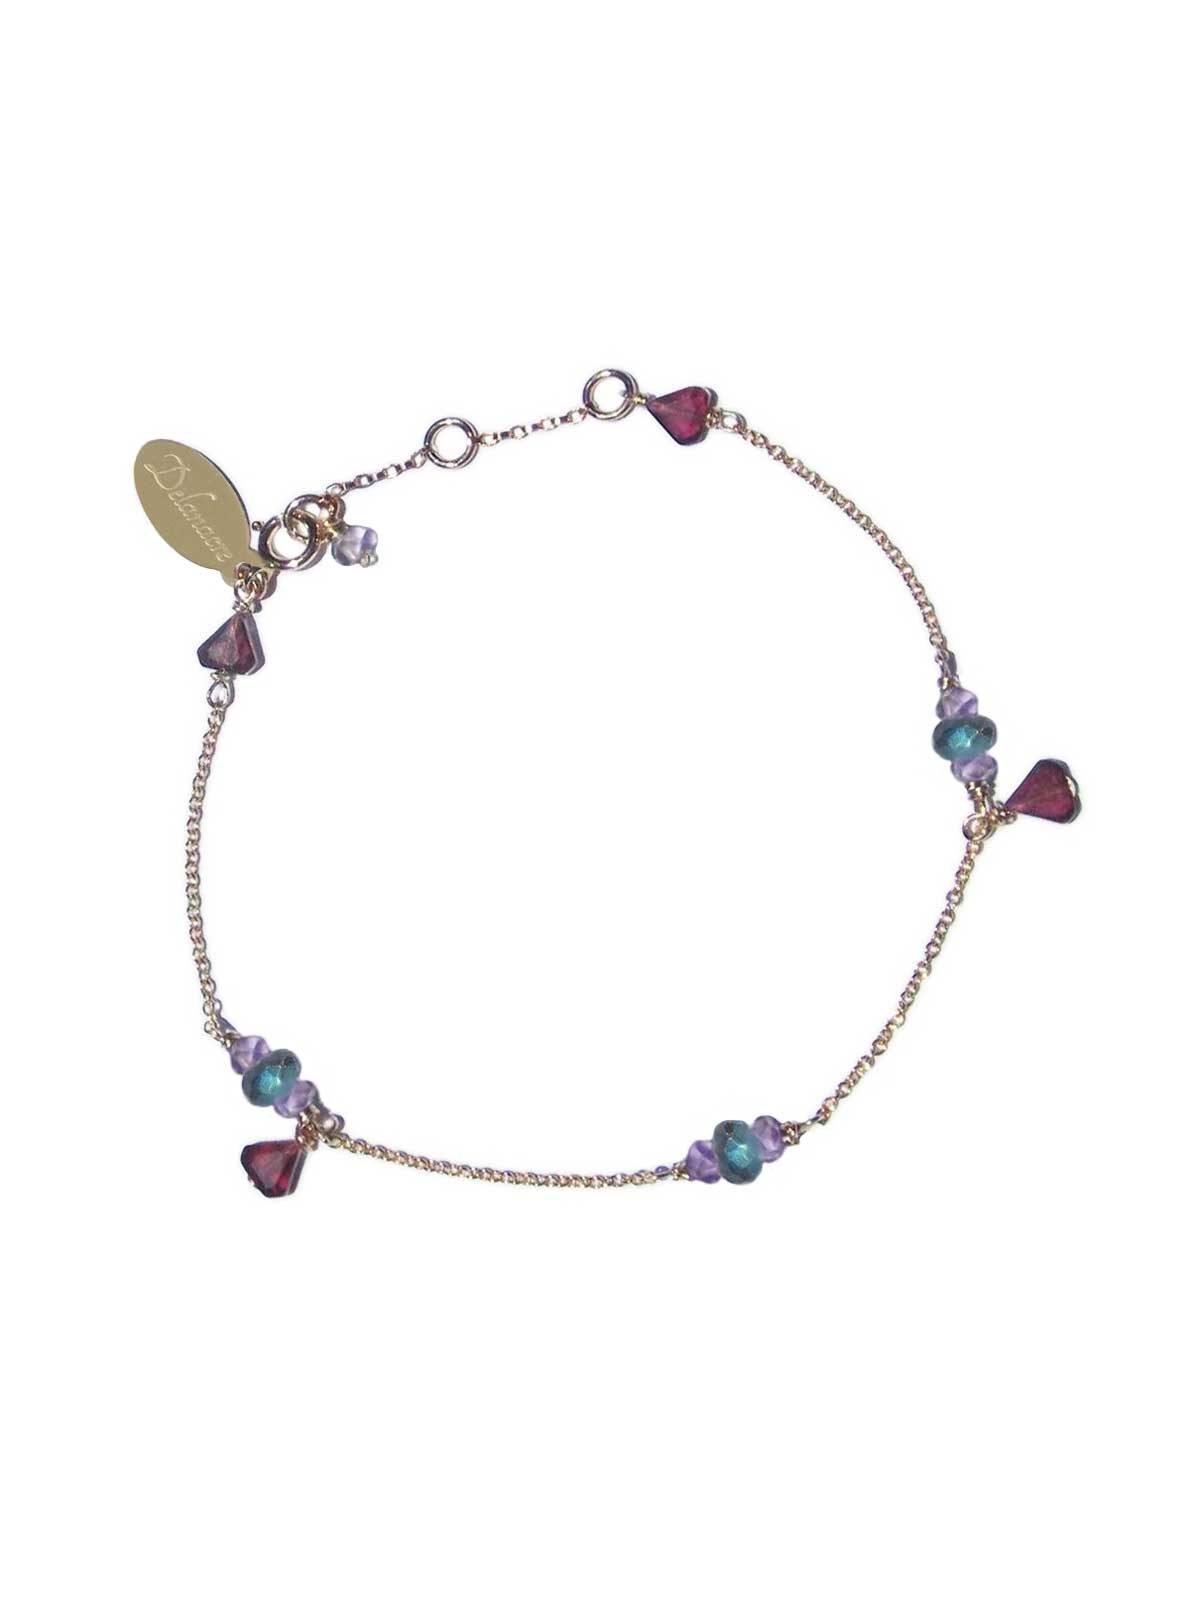 Bracelet Gold-filled 14 Karat chain, with Semi-precious stones : Garnet Amethyst Labradorite